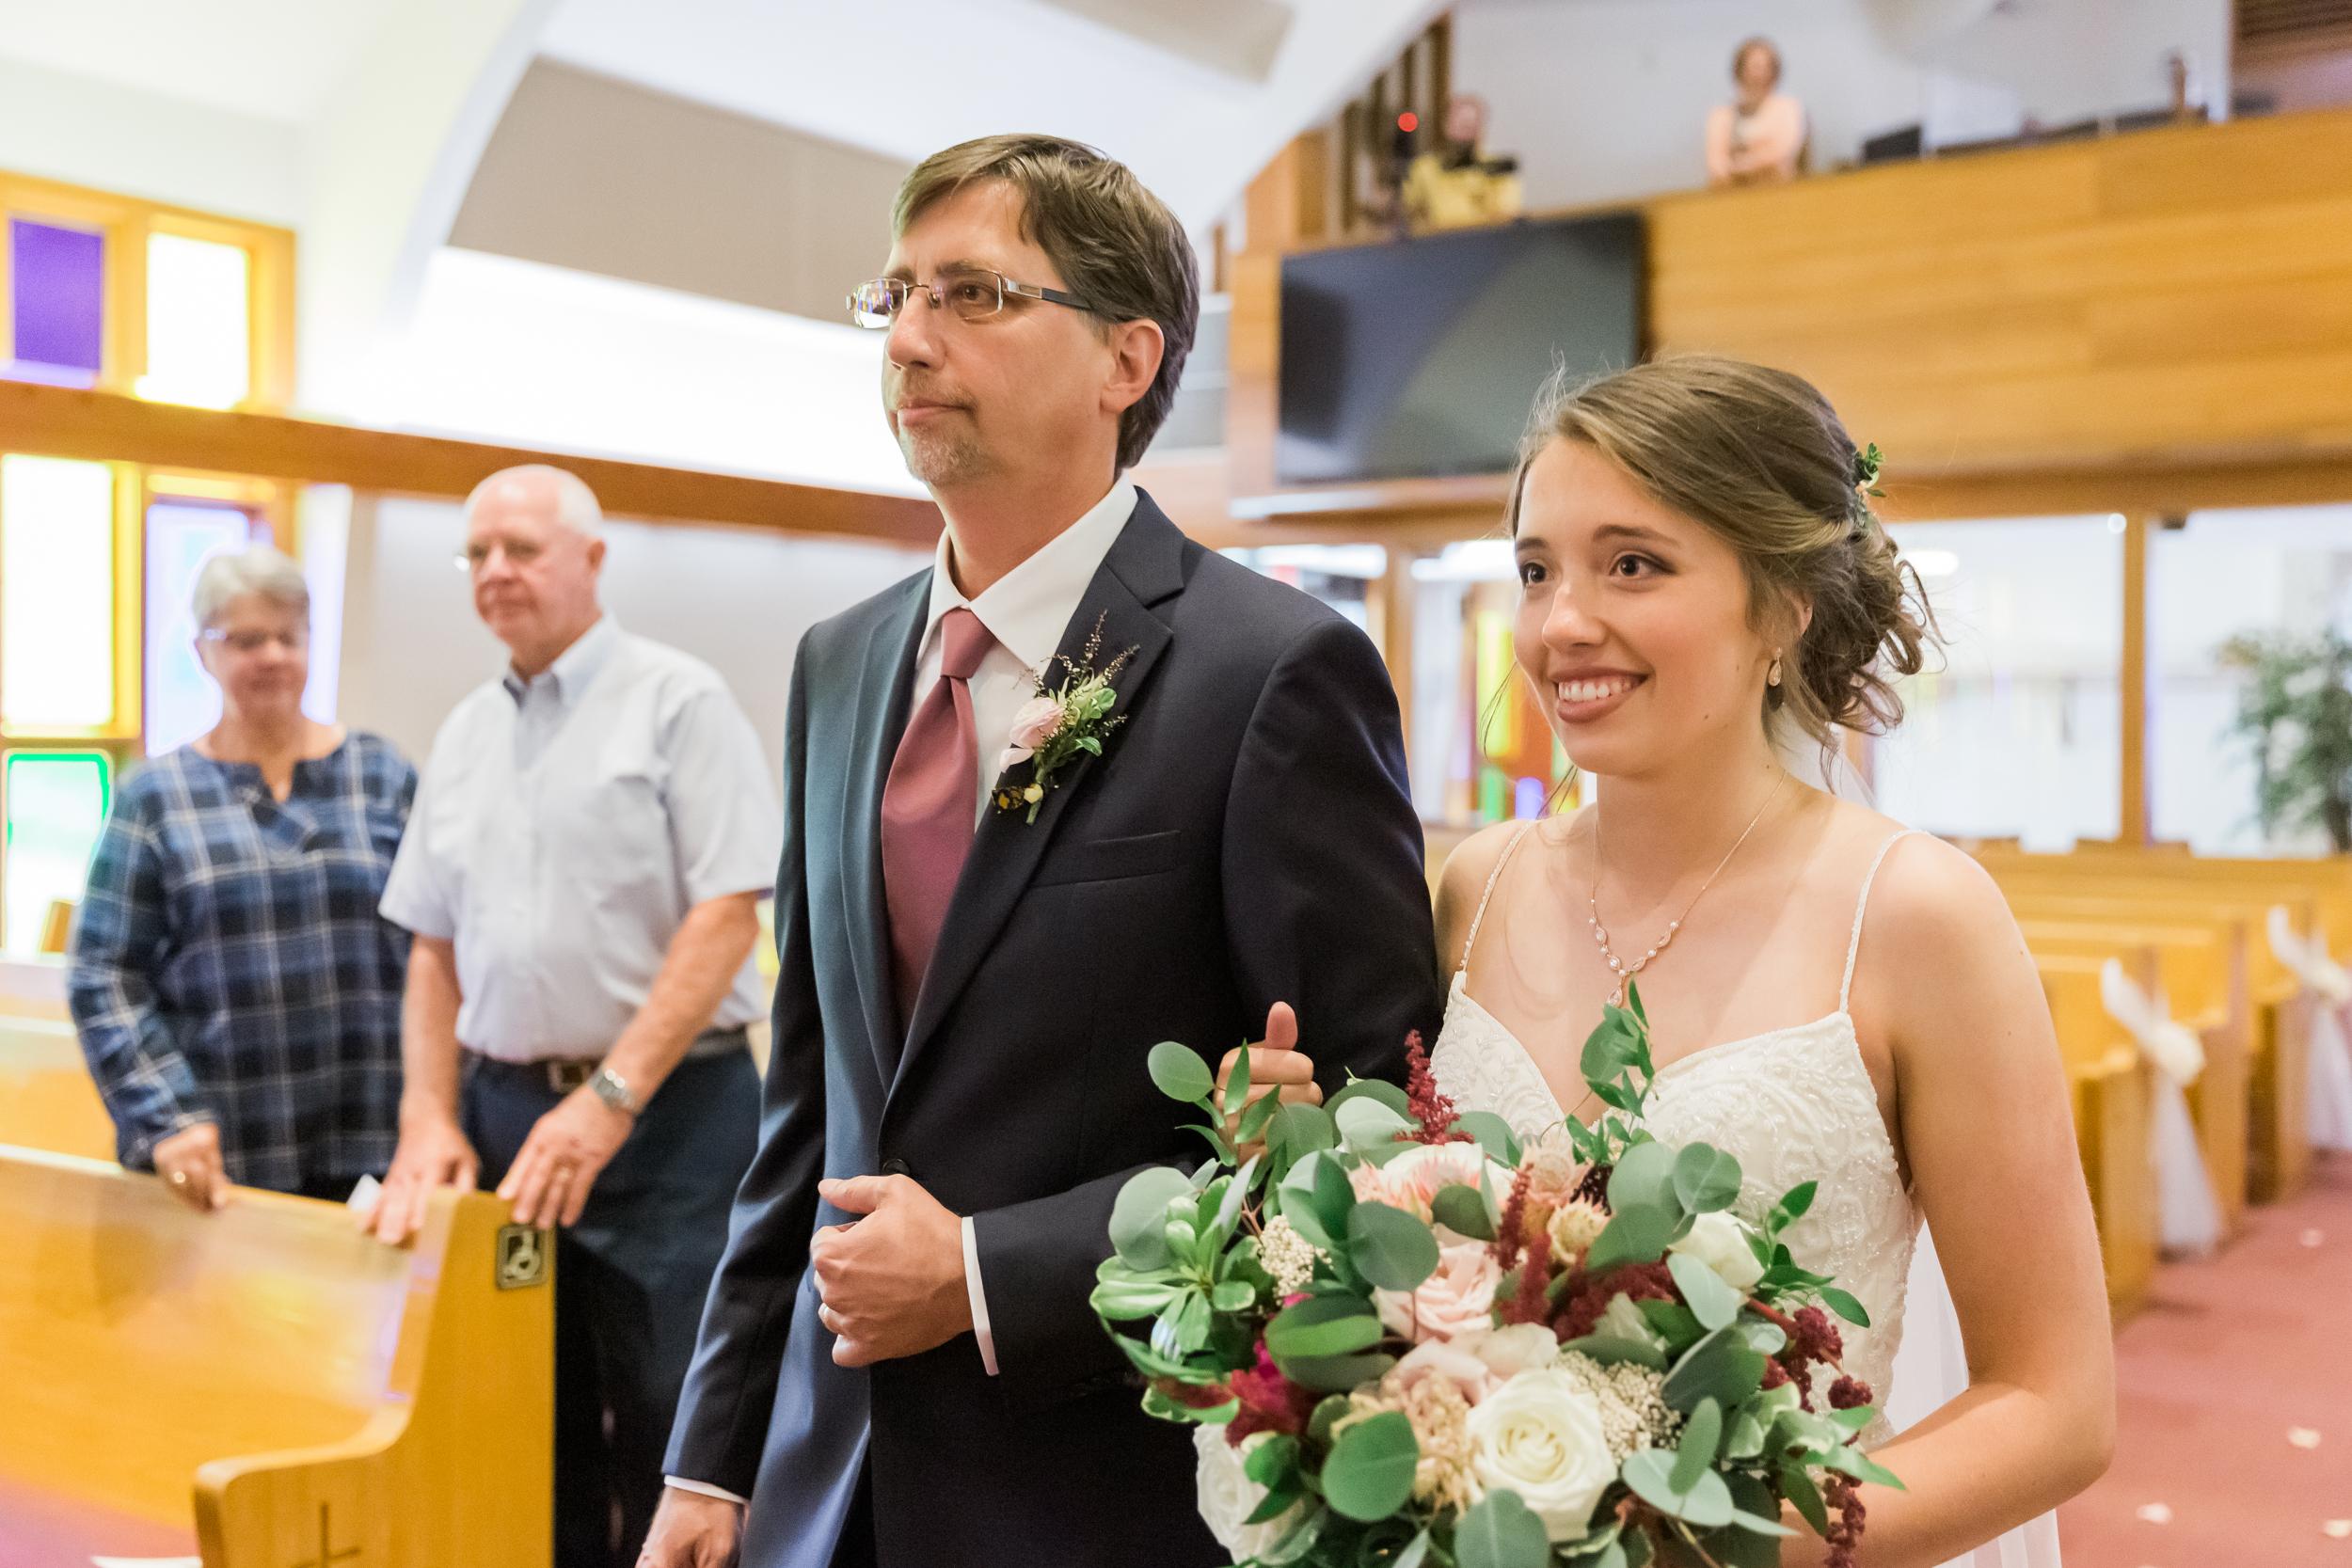 calebclairewedding-43.jpg